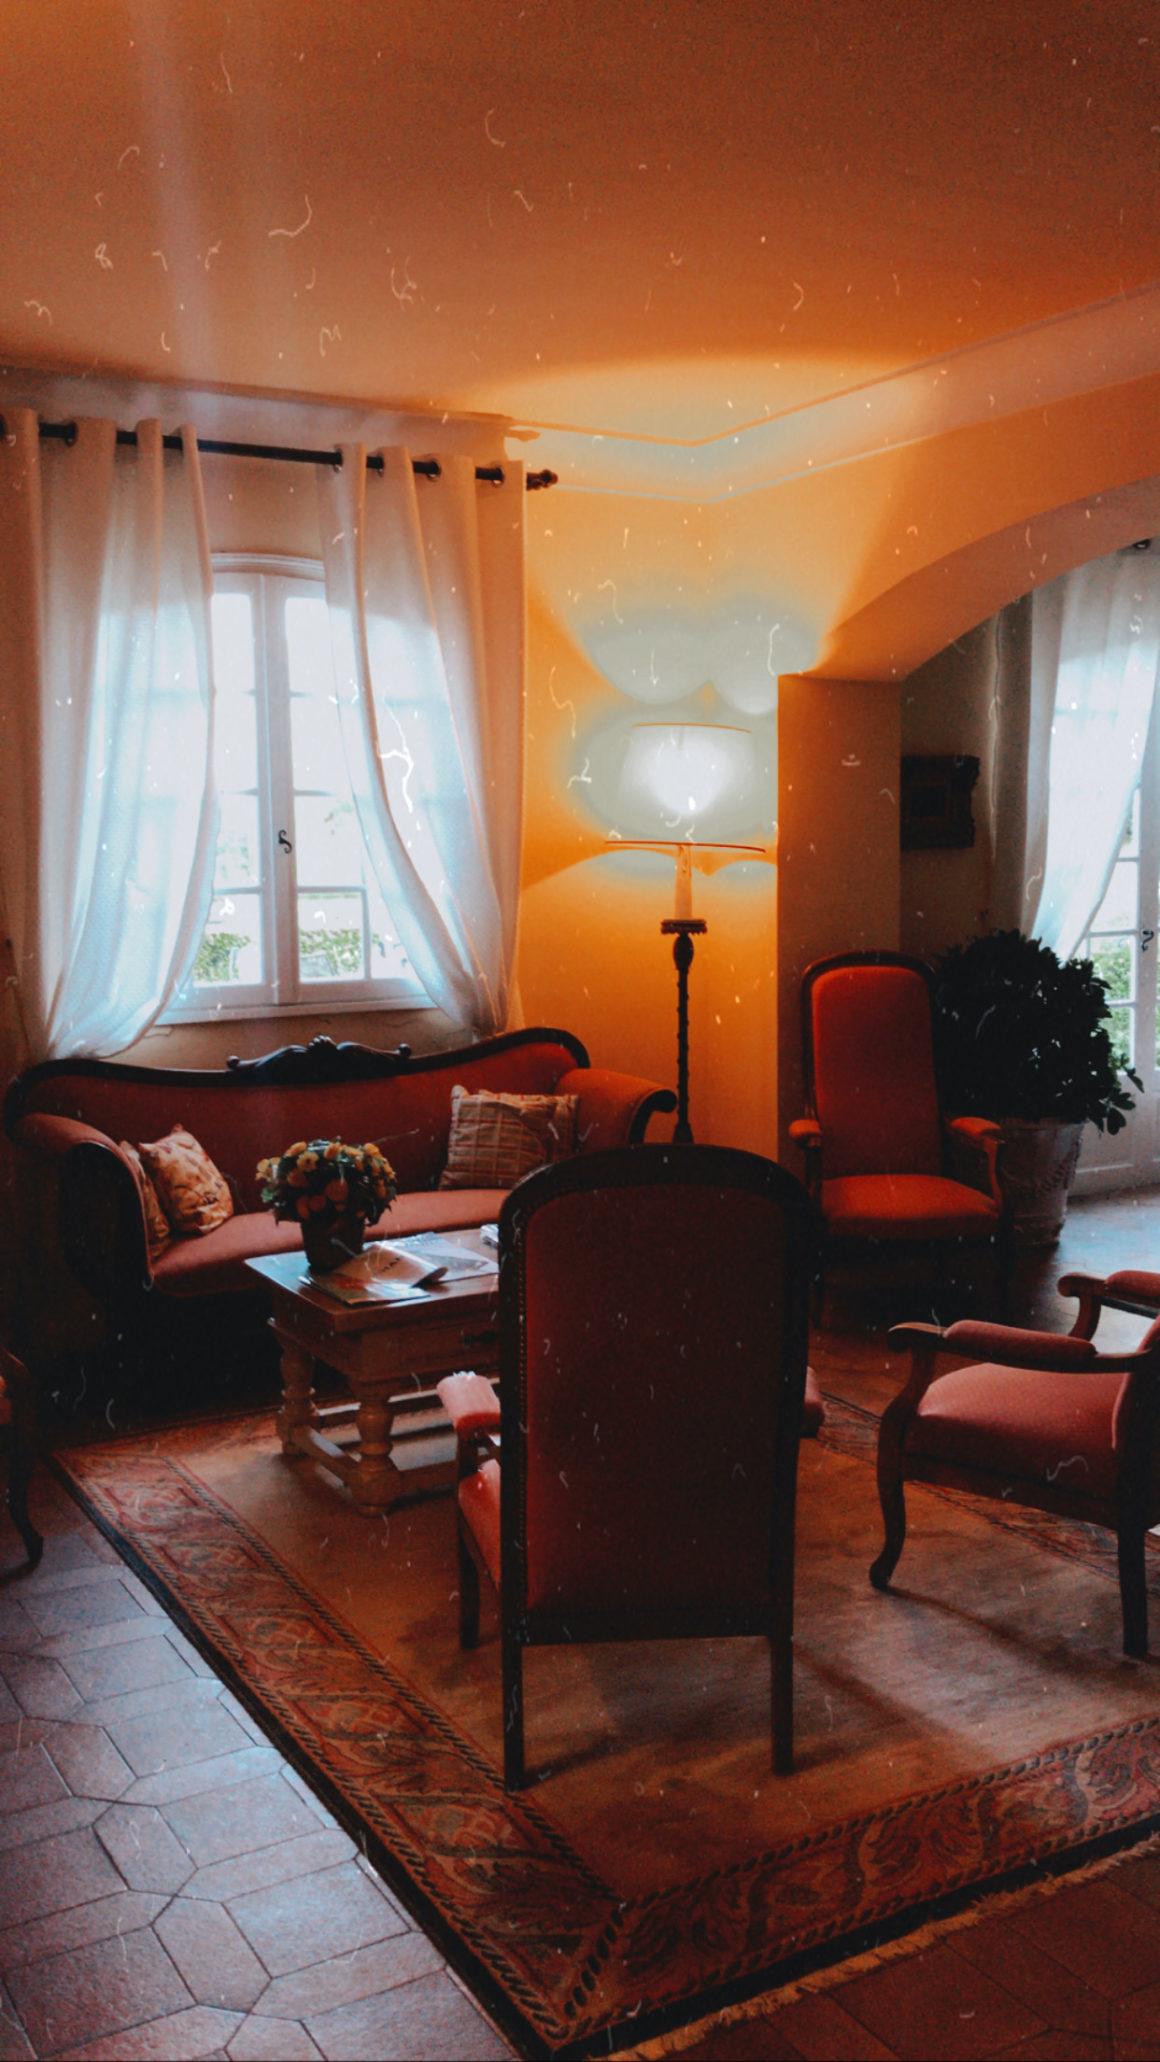 La Bastide du Calalou, hôtel-restaurant 4 étoiles